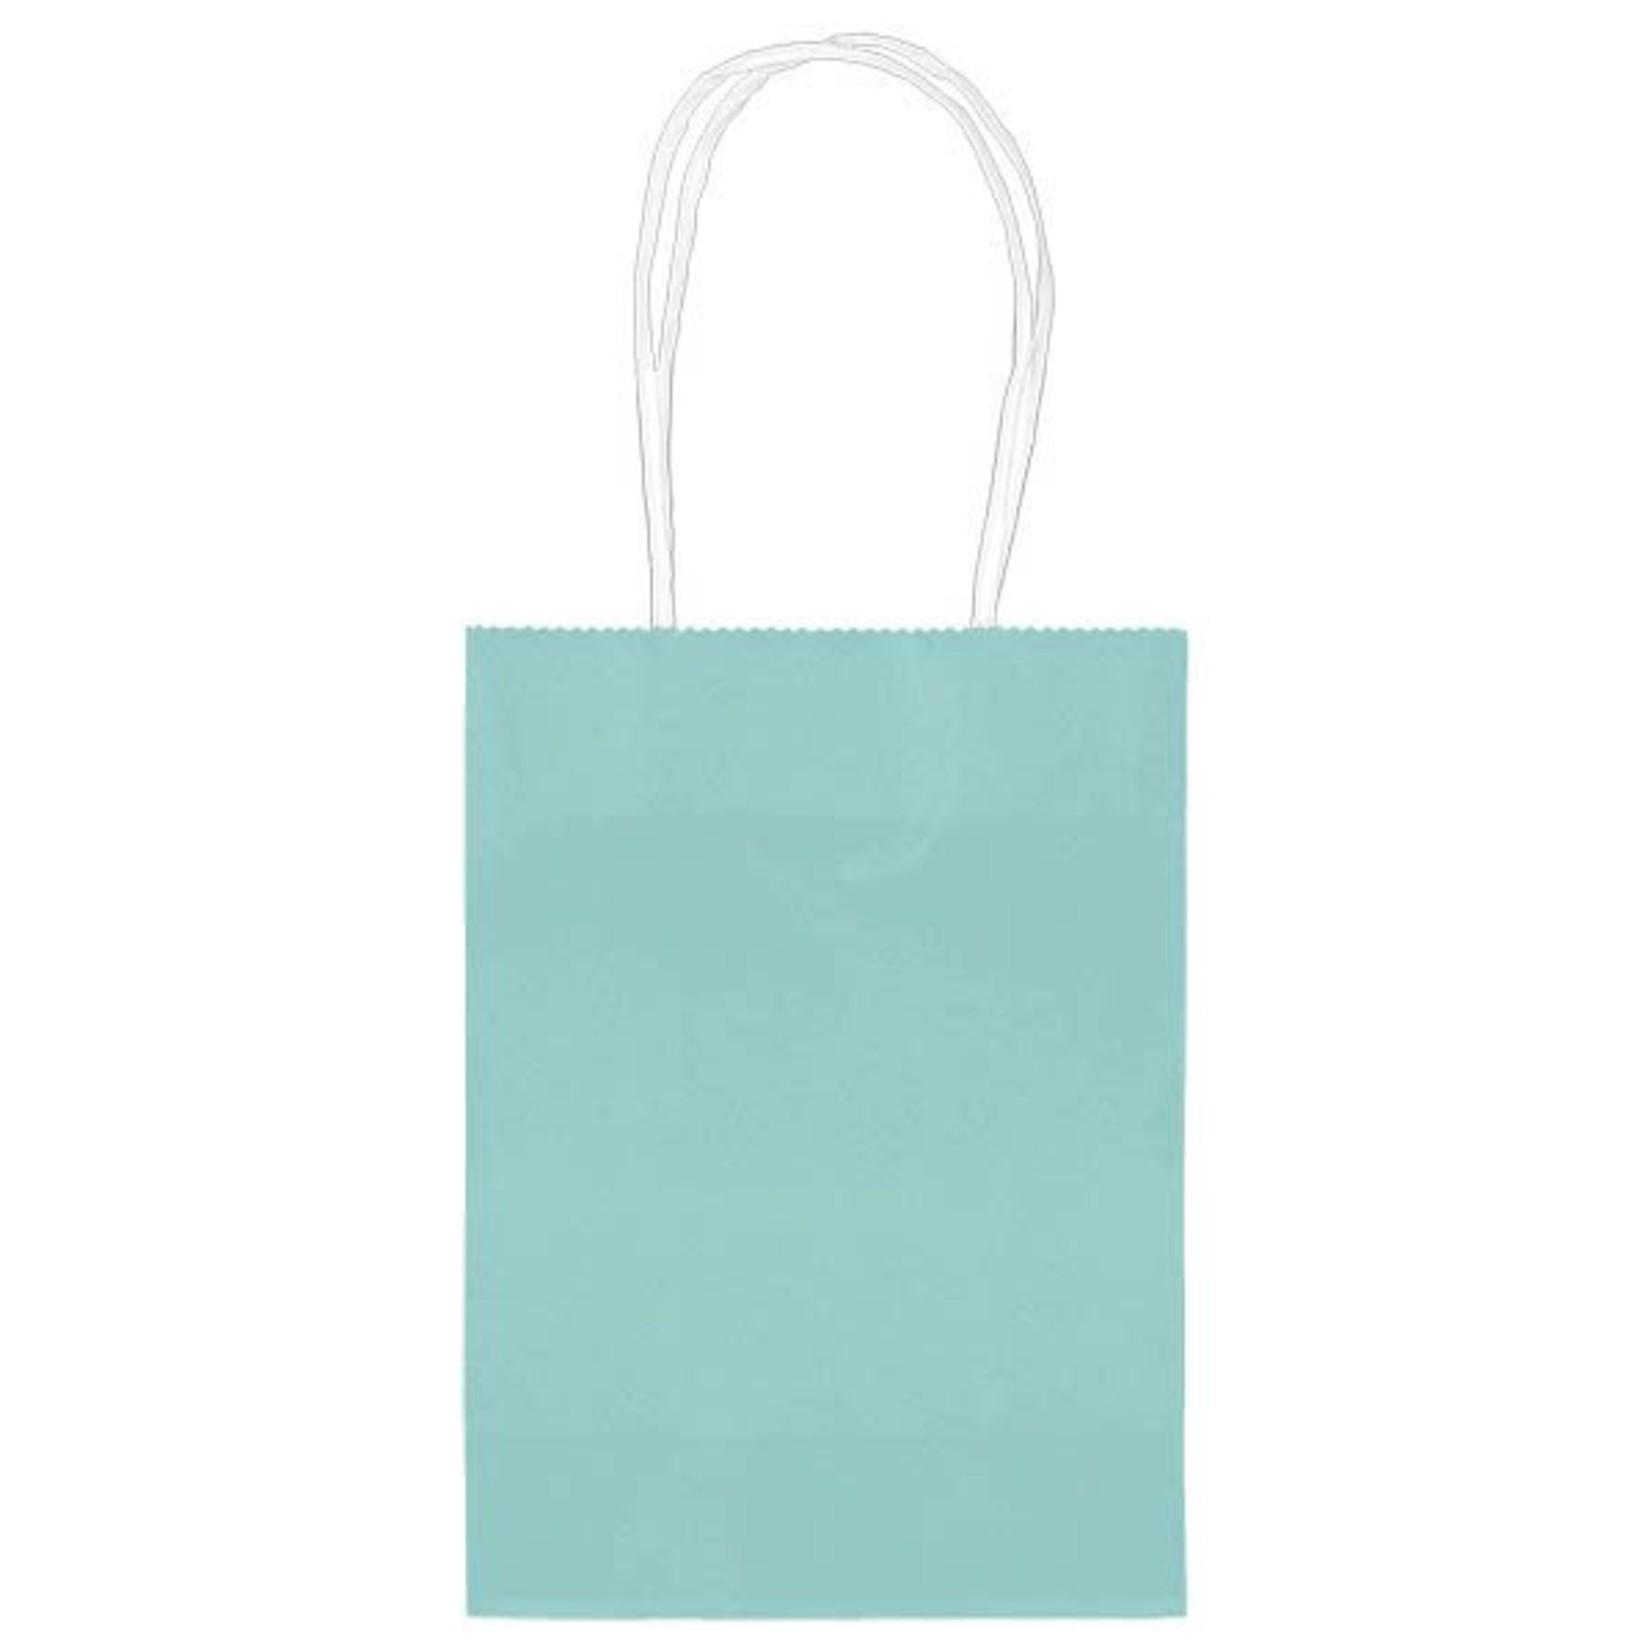 Bag-Mini-Robin's Egg Blue-5''